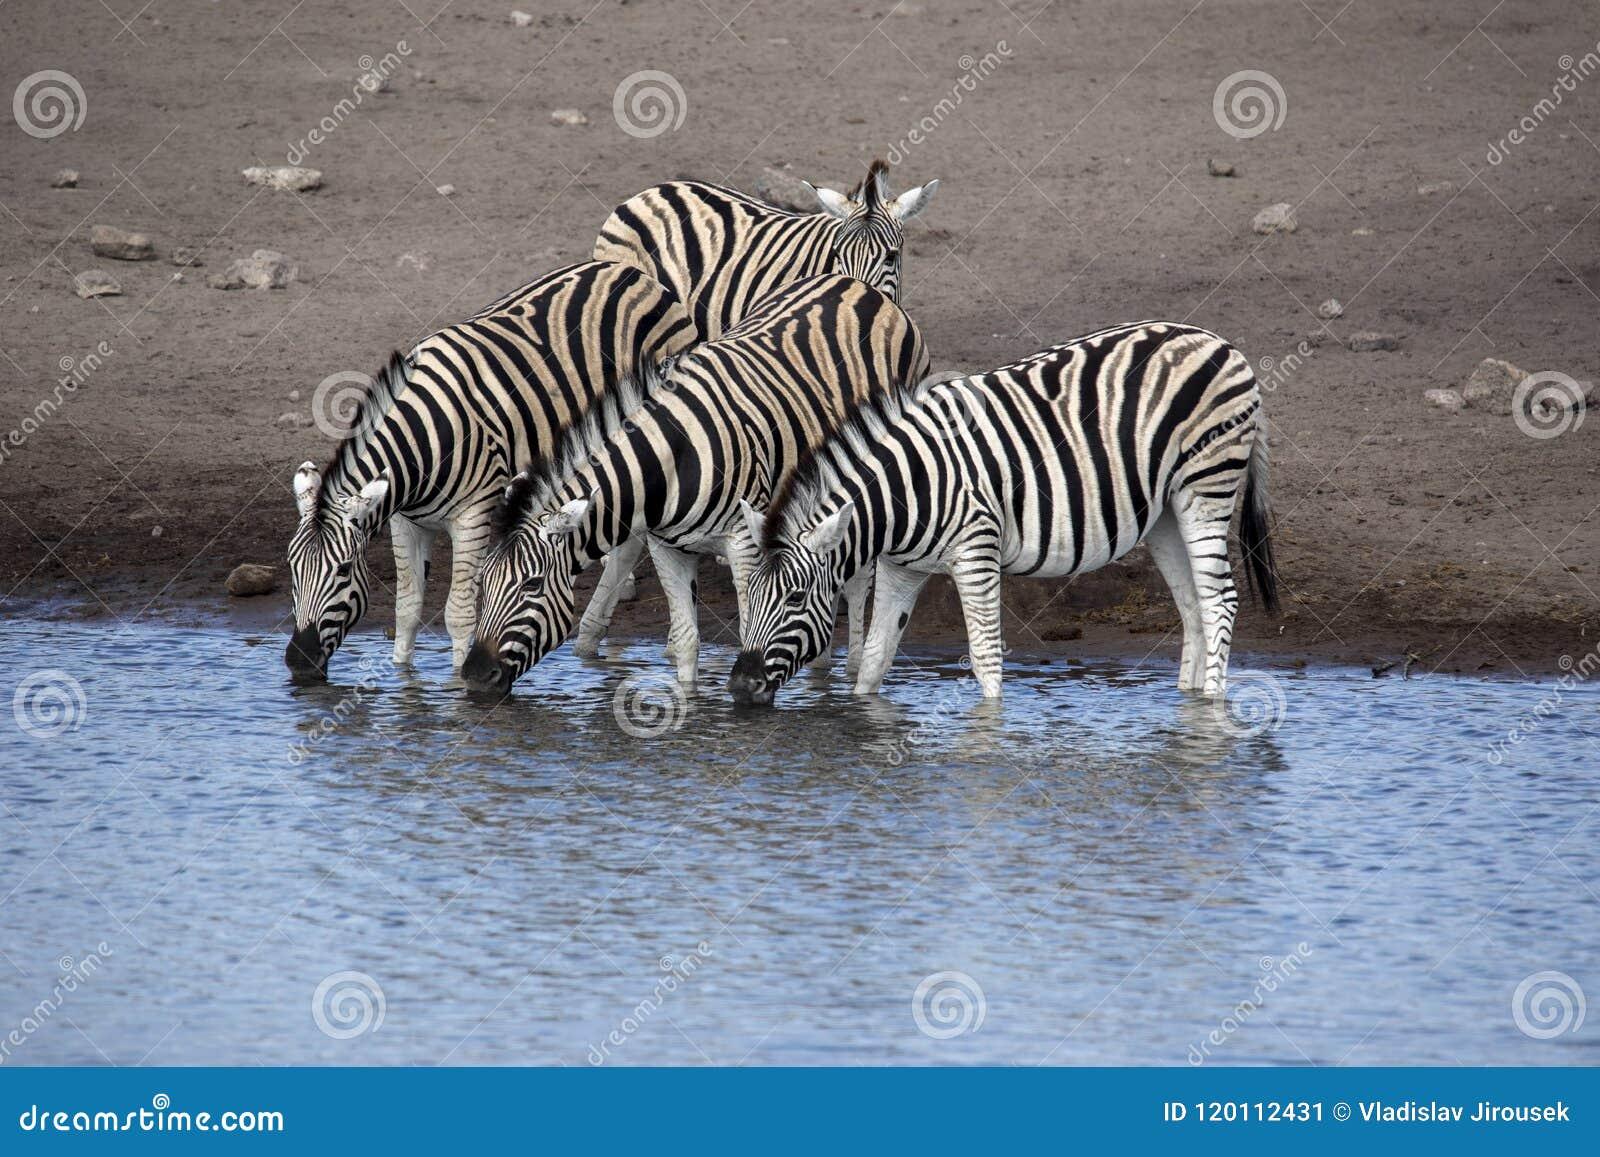 Damara zebra herd, Equus burchelli antiquorum, drinking in the waterhole Etosha National Park, Namibia